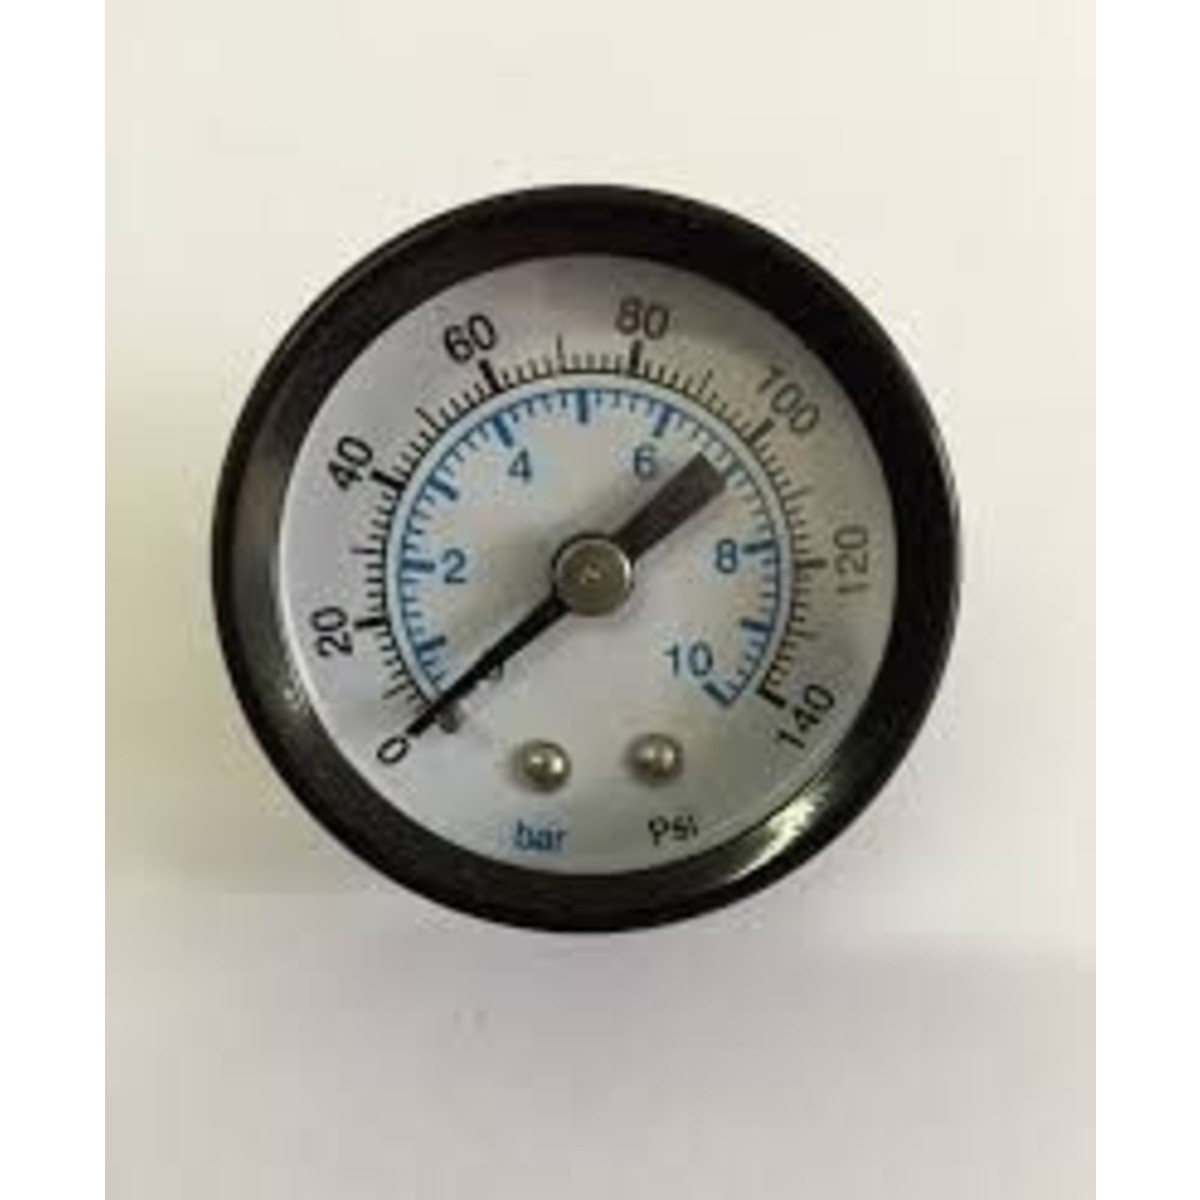 Manômetro  Horizontal Rosca Traseira 1/8 140Lbs 40mm  - Rea Comércio - Sua Loja Completa!